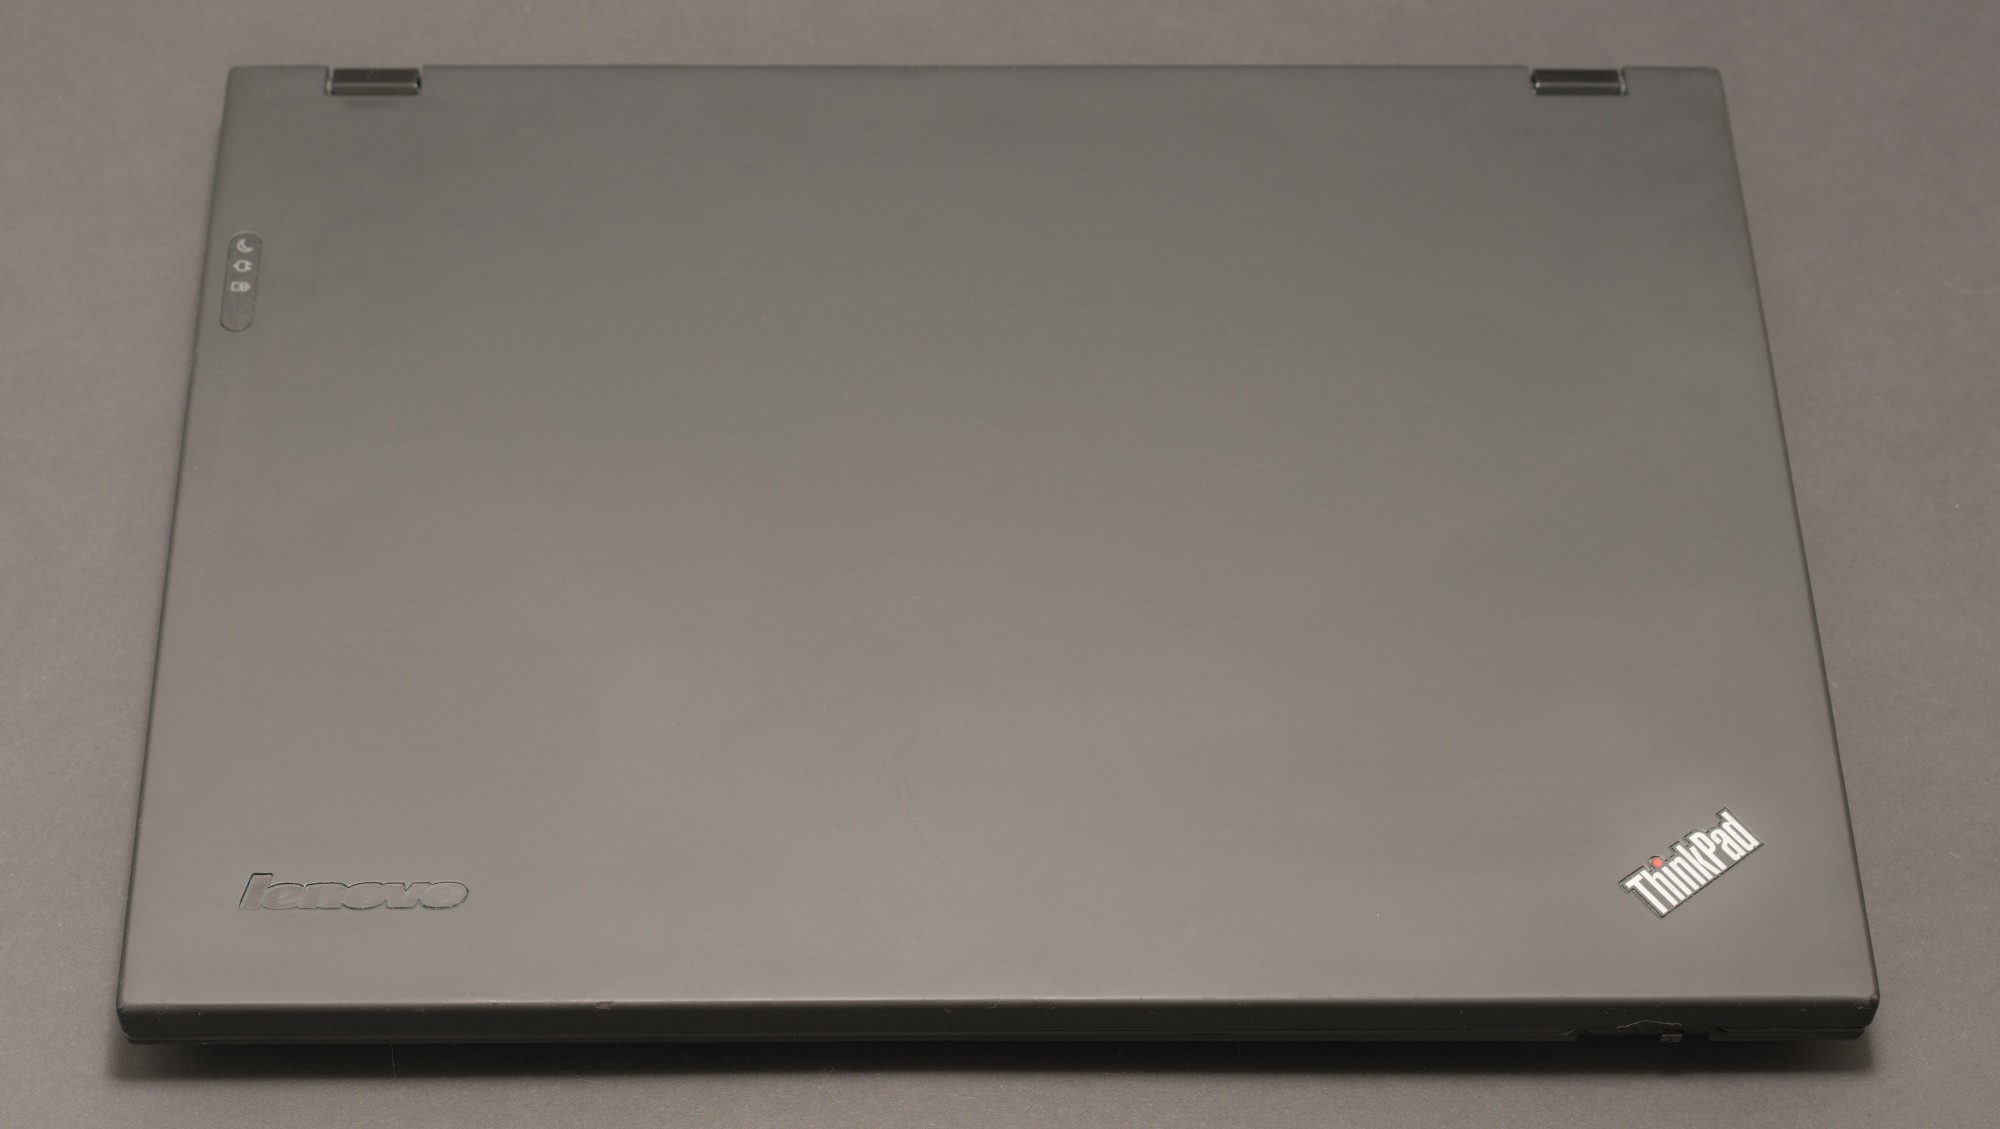 Древности: десять лет эволюции ноутбуков на примере ThinkPad X301 - 16